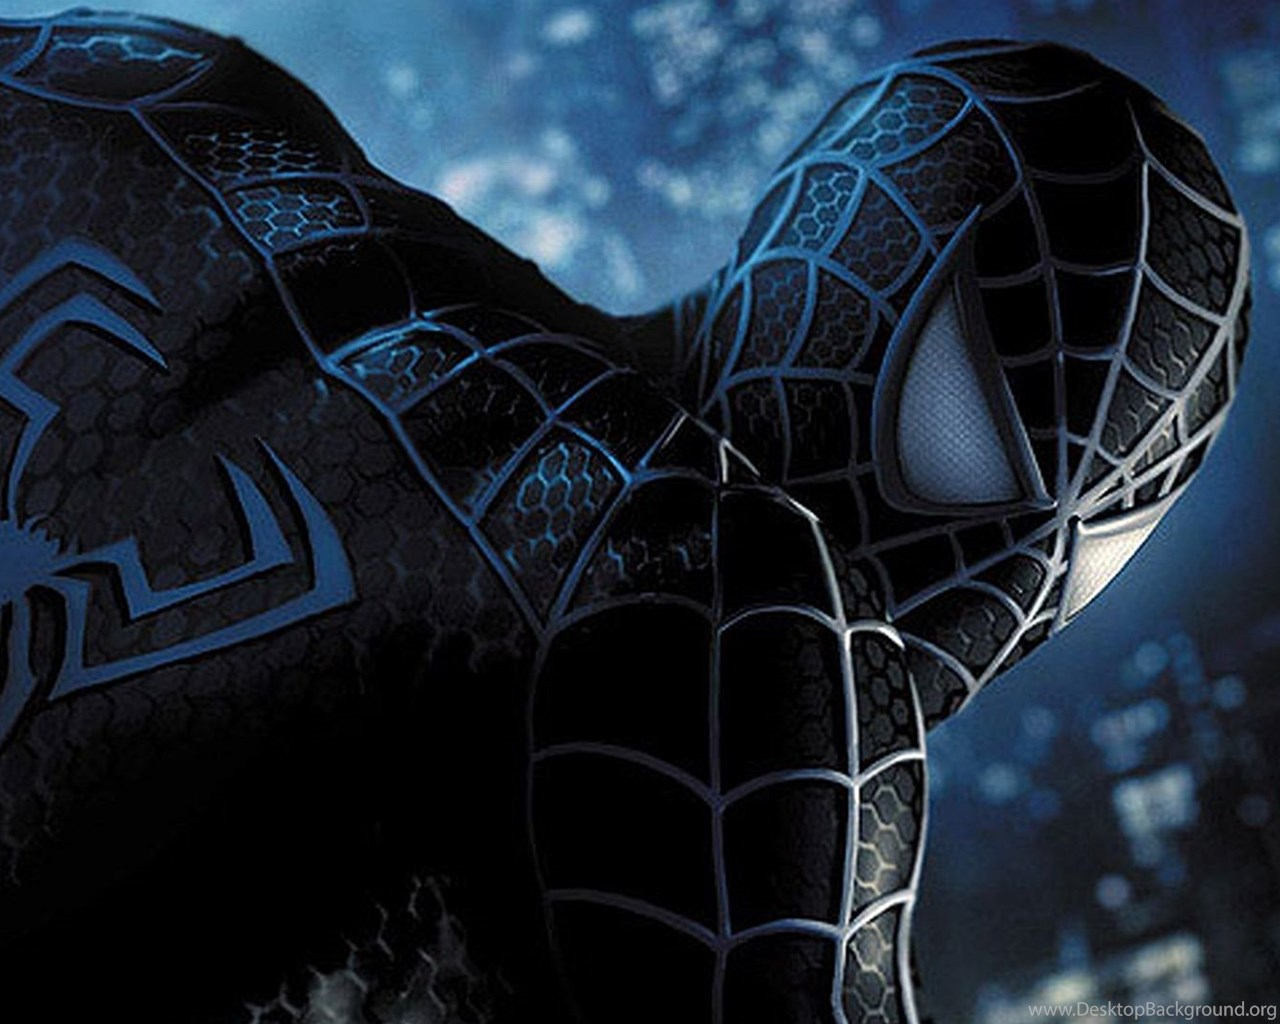 Spider man black gallery, amateur sex stars